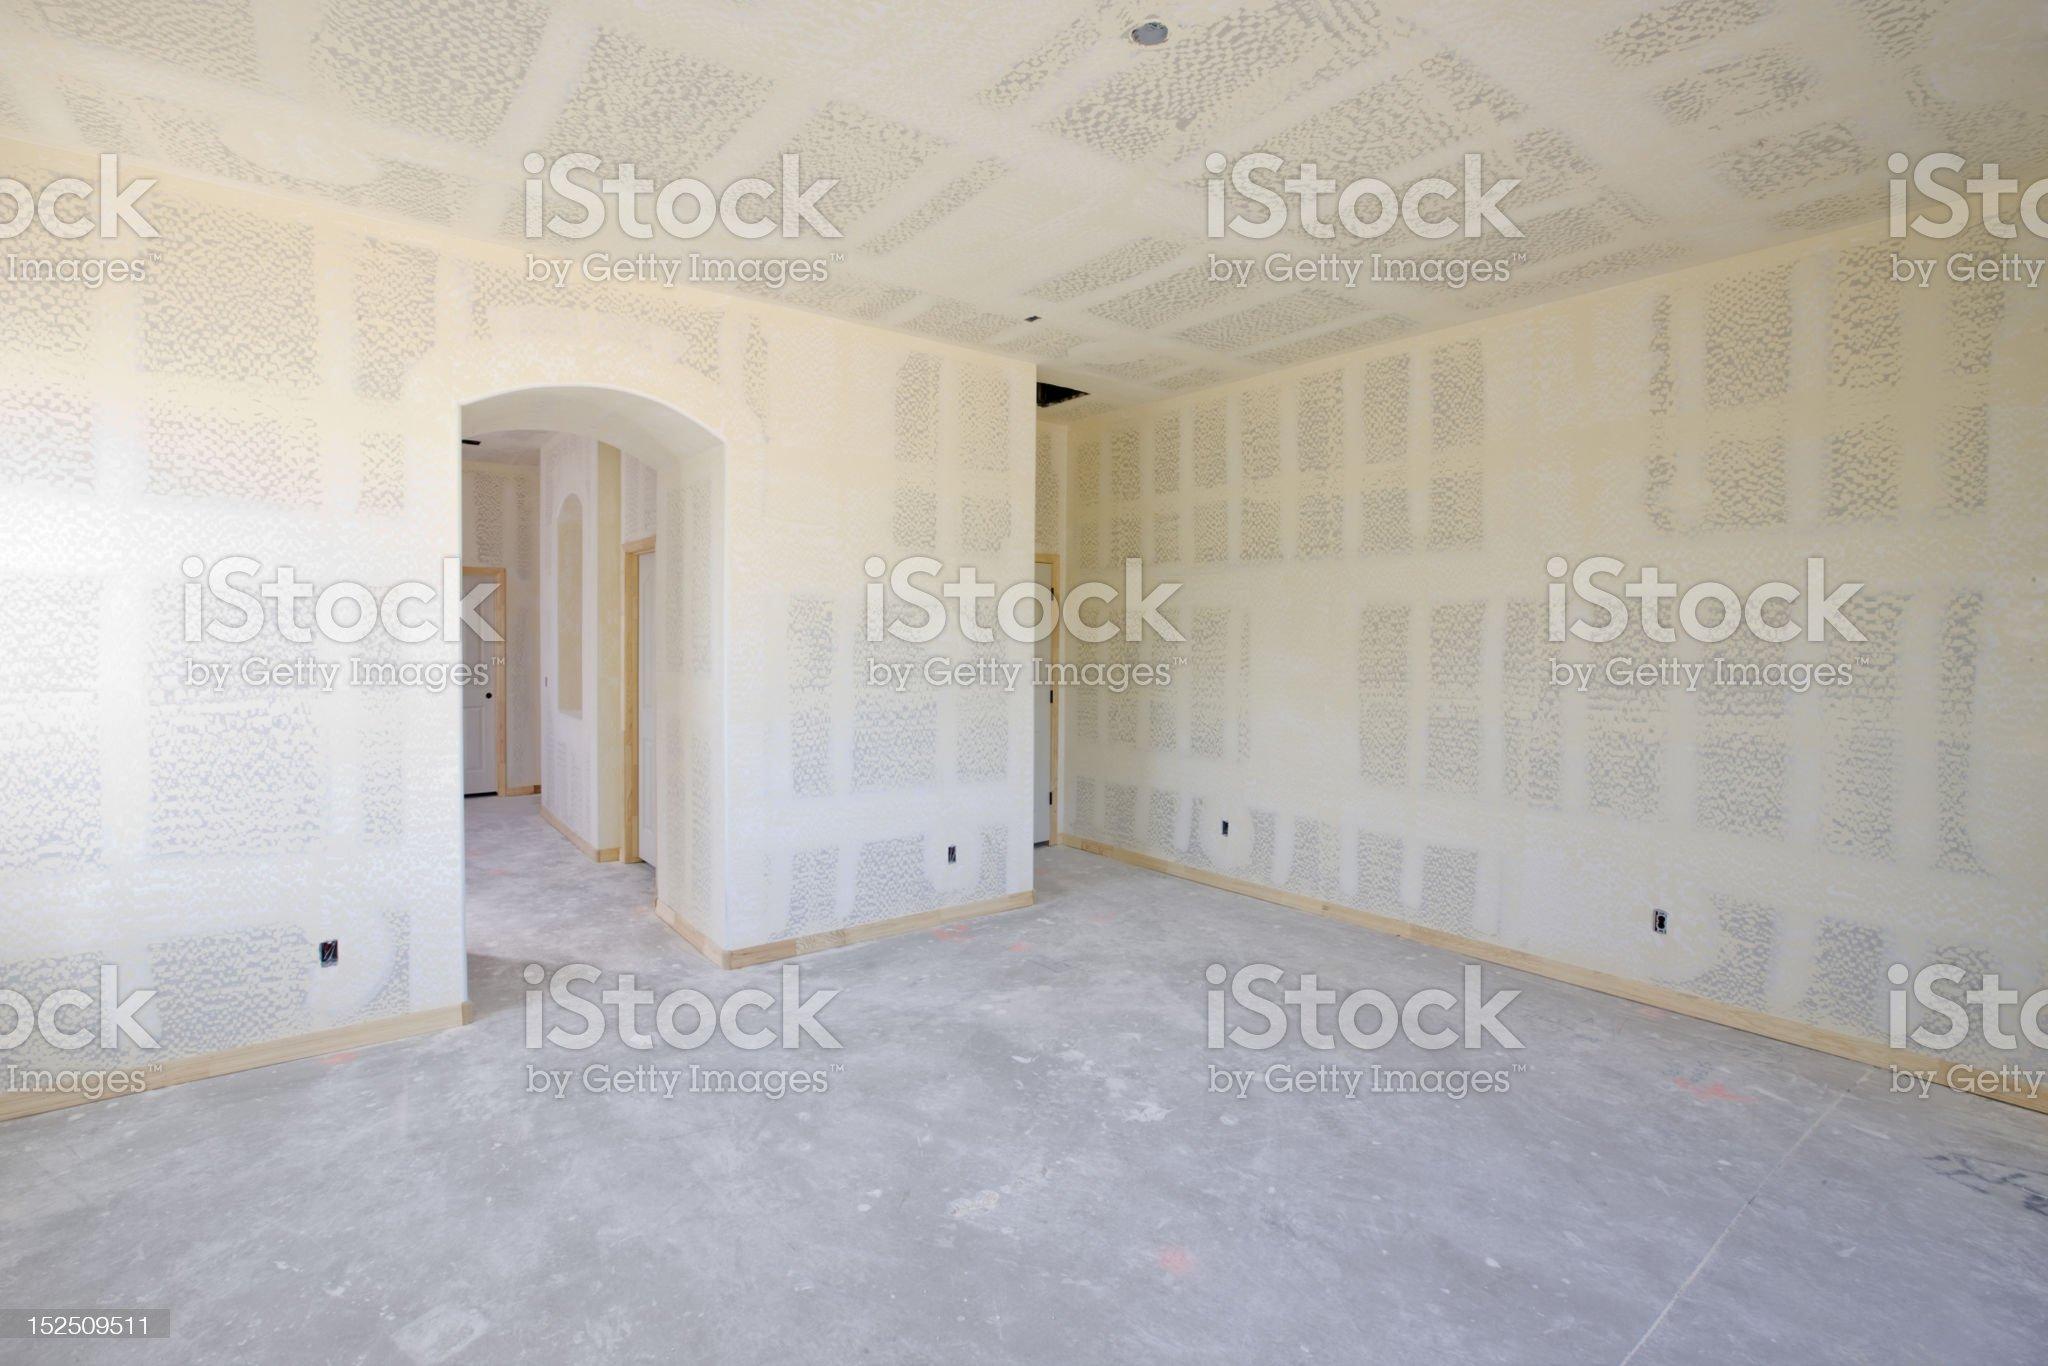 New Construction Interior Drywall Empty Room royalty-free stock photo